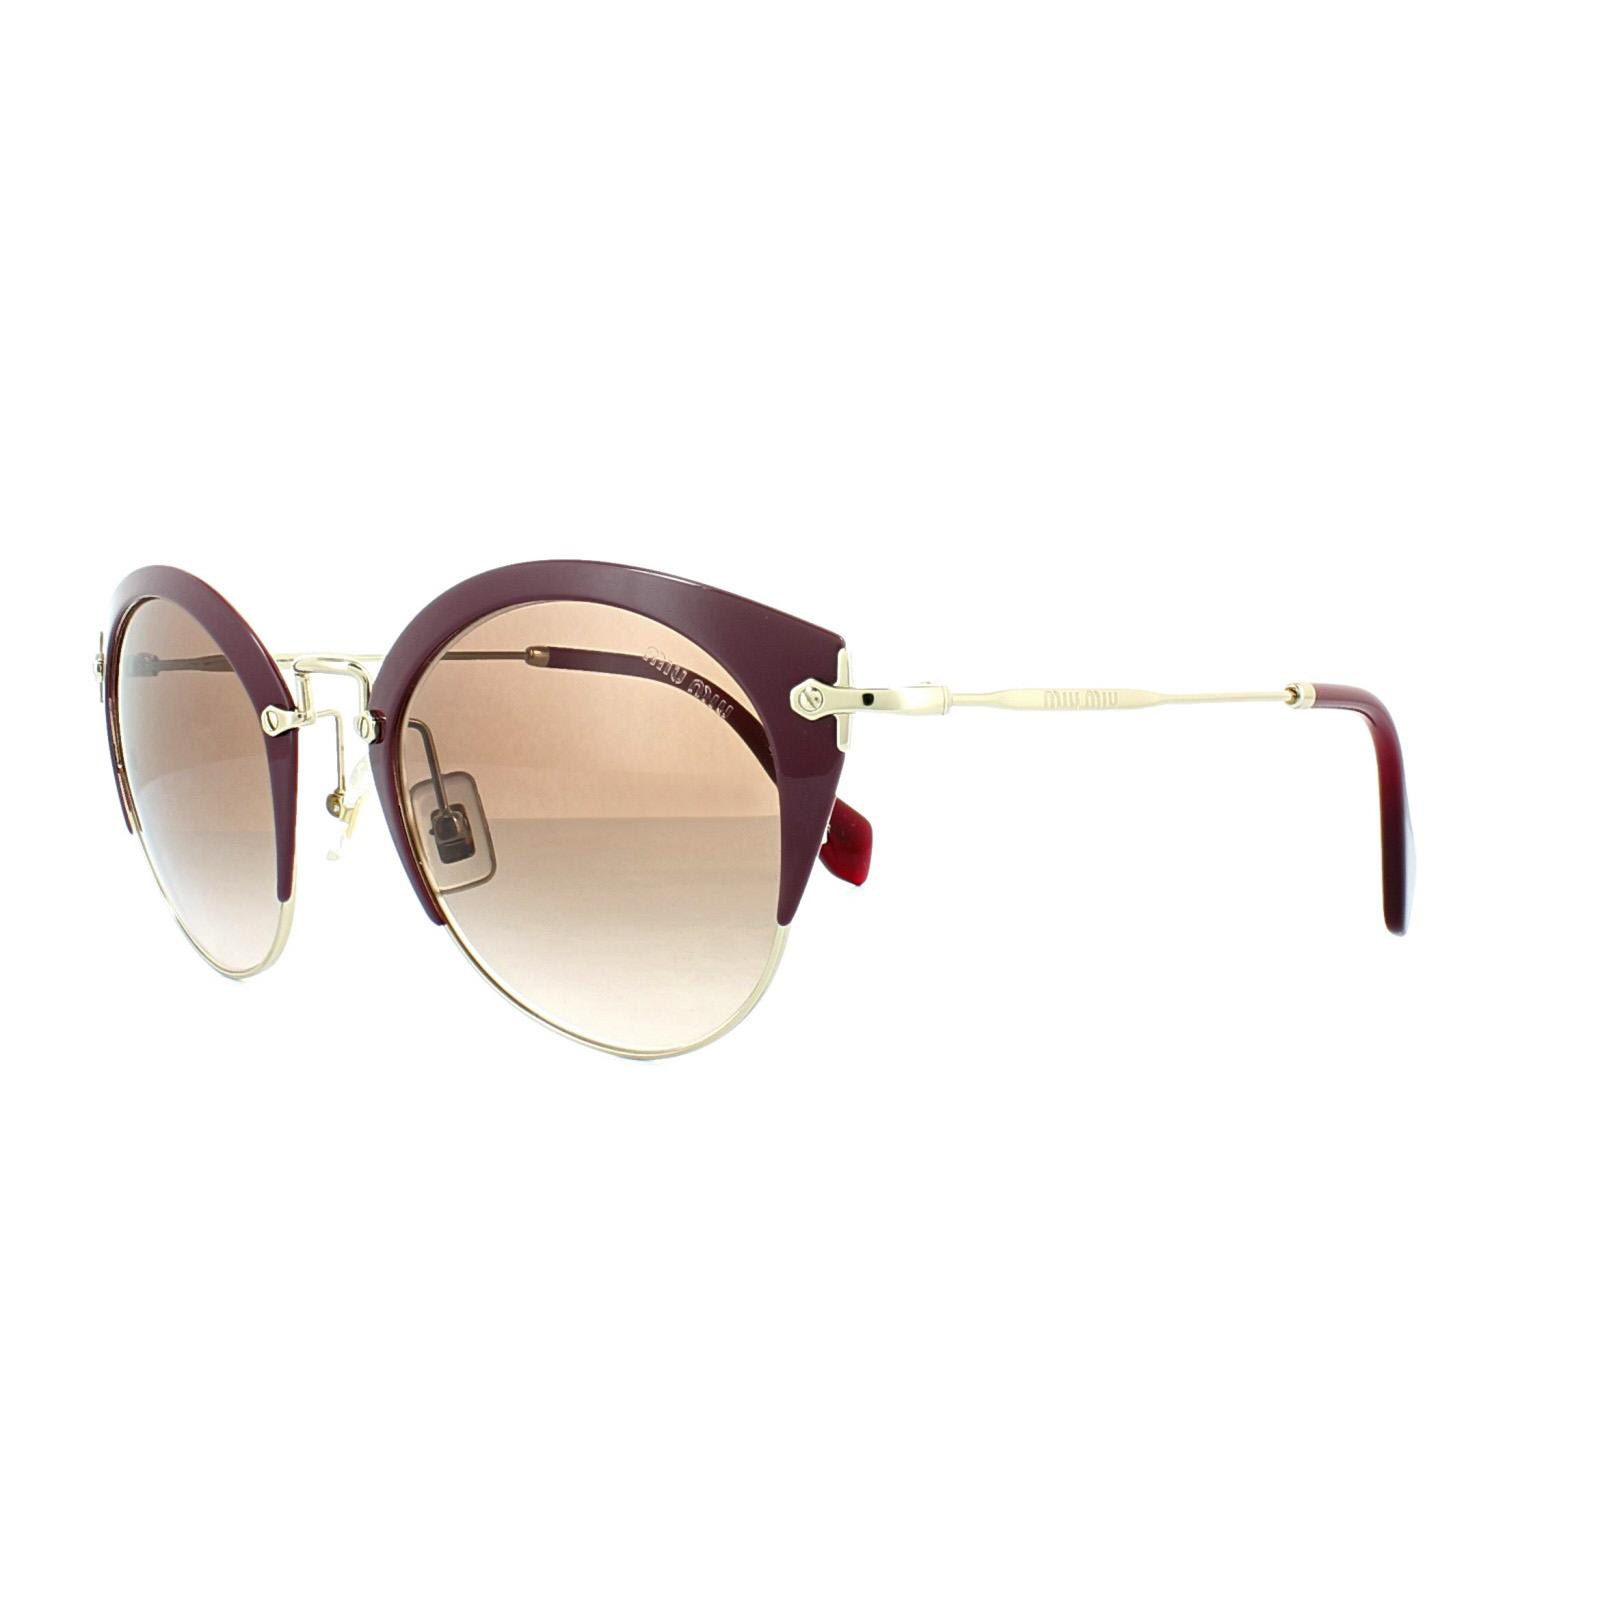 SENTINEL Miu Miu occhiali da sole 53RS UA50A6 amaranto pallido oro marrone  sfumato 273947ebd11